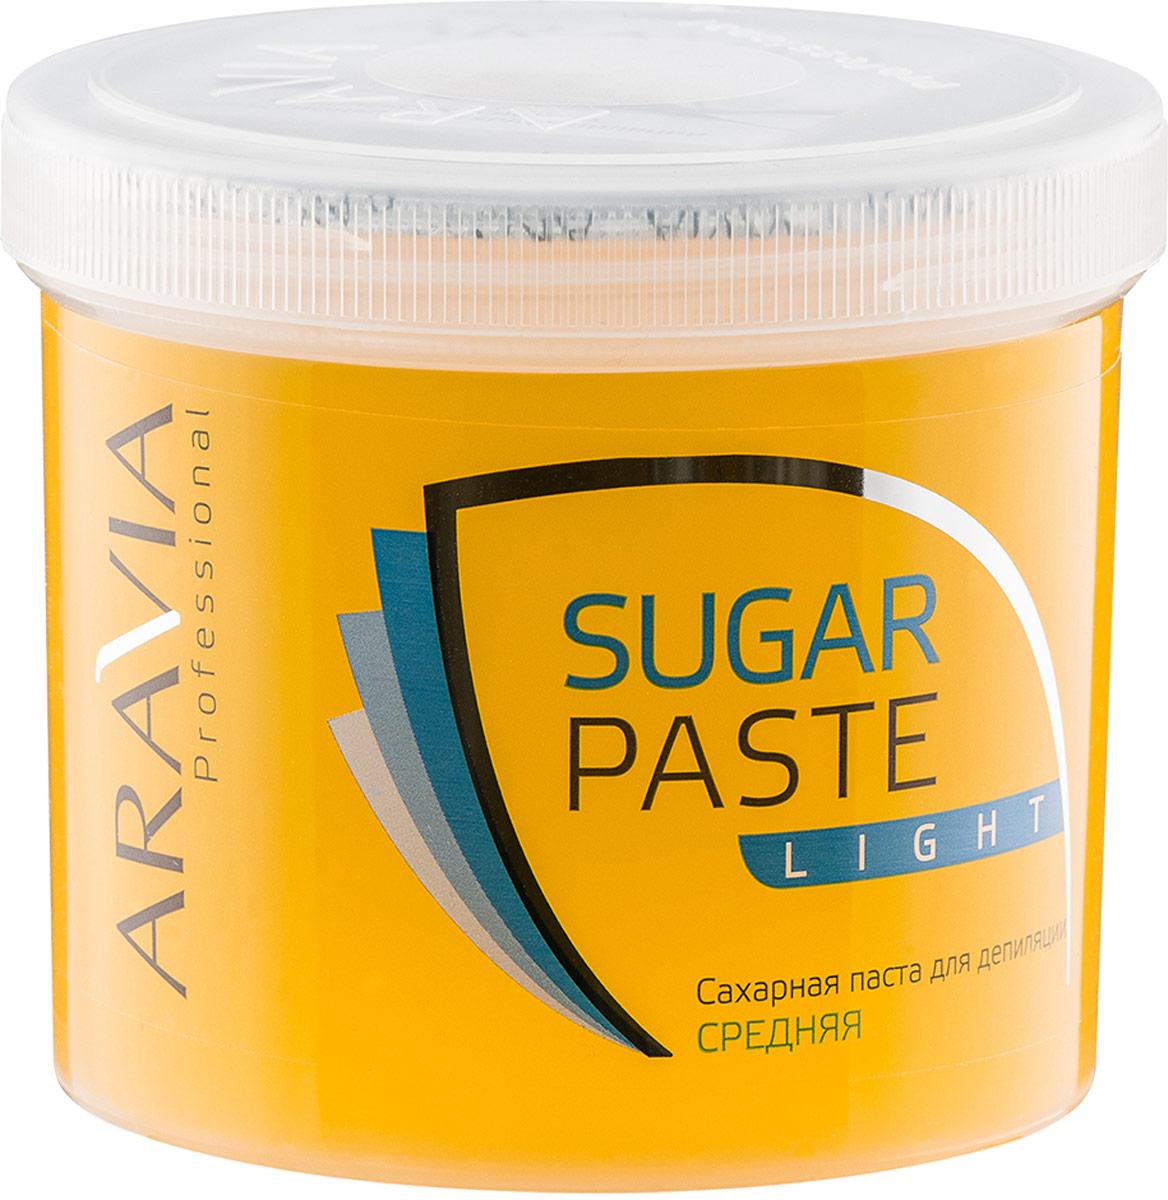 Aravia Professional Сахарная паста для депиляции Легкая средней консистенции, 750 г